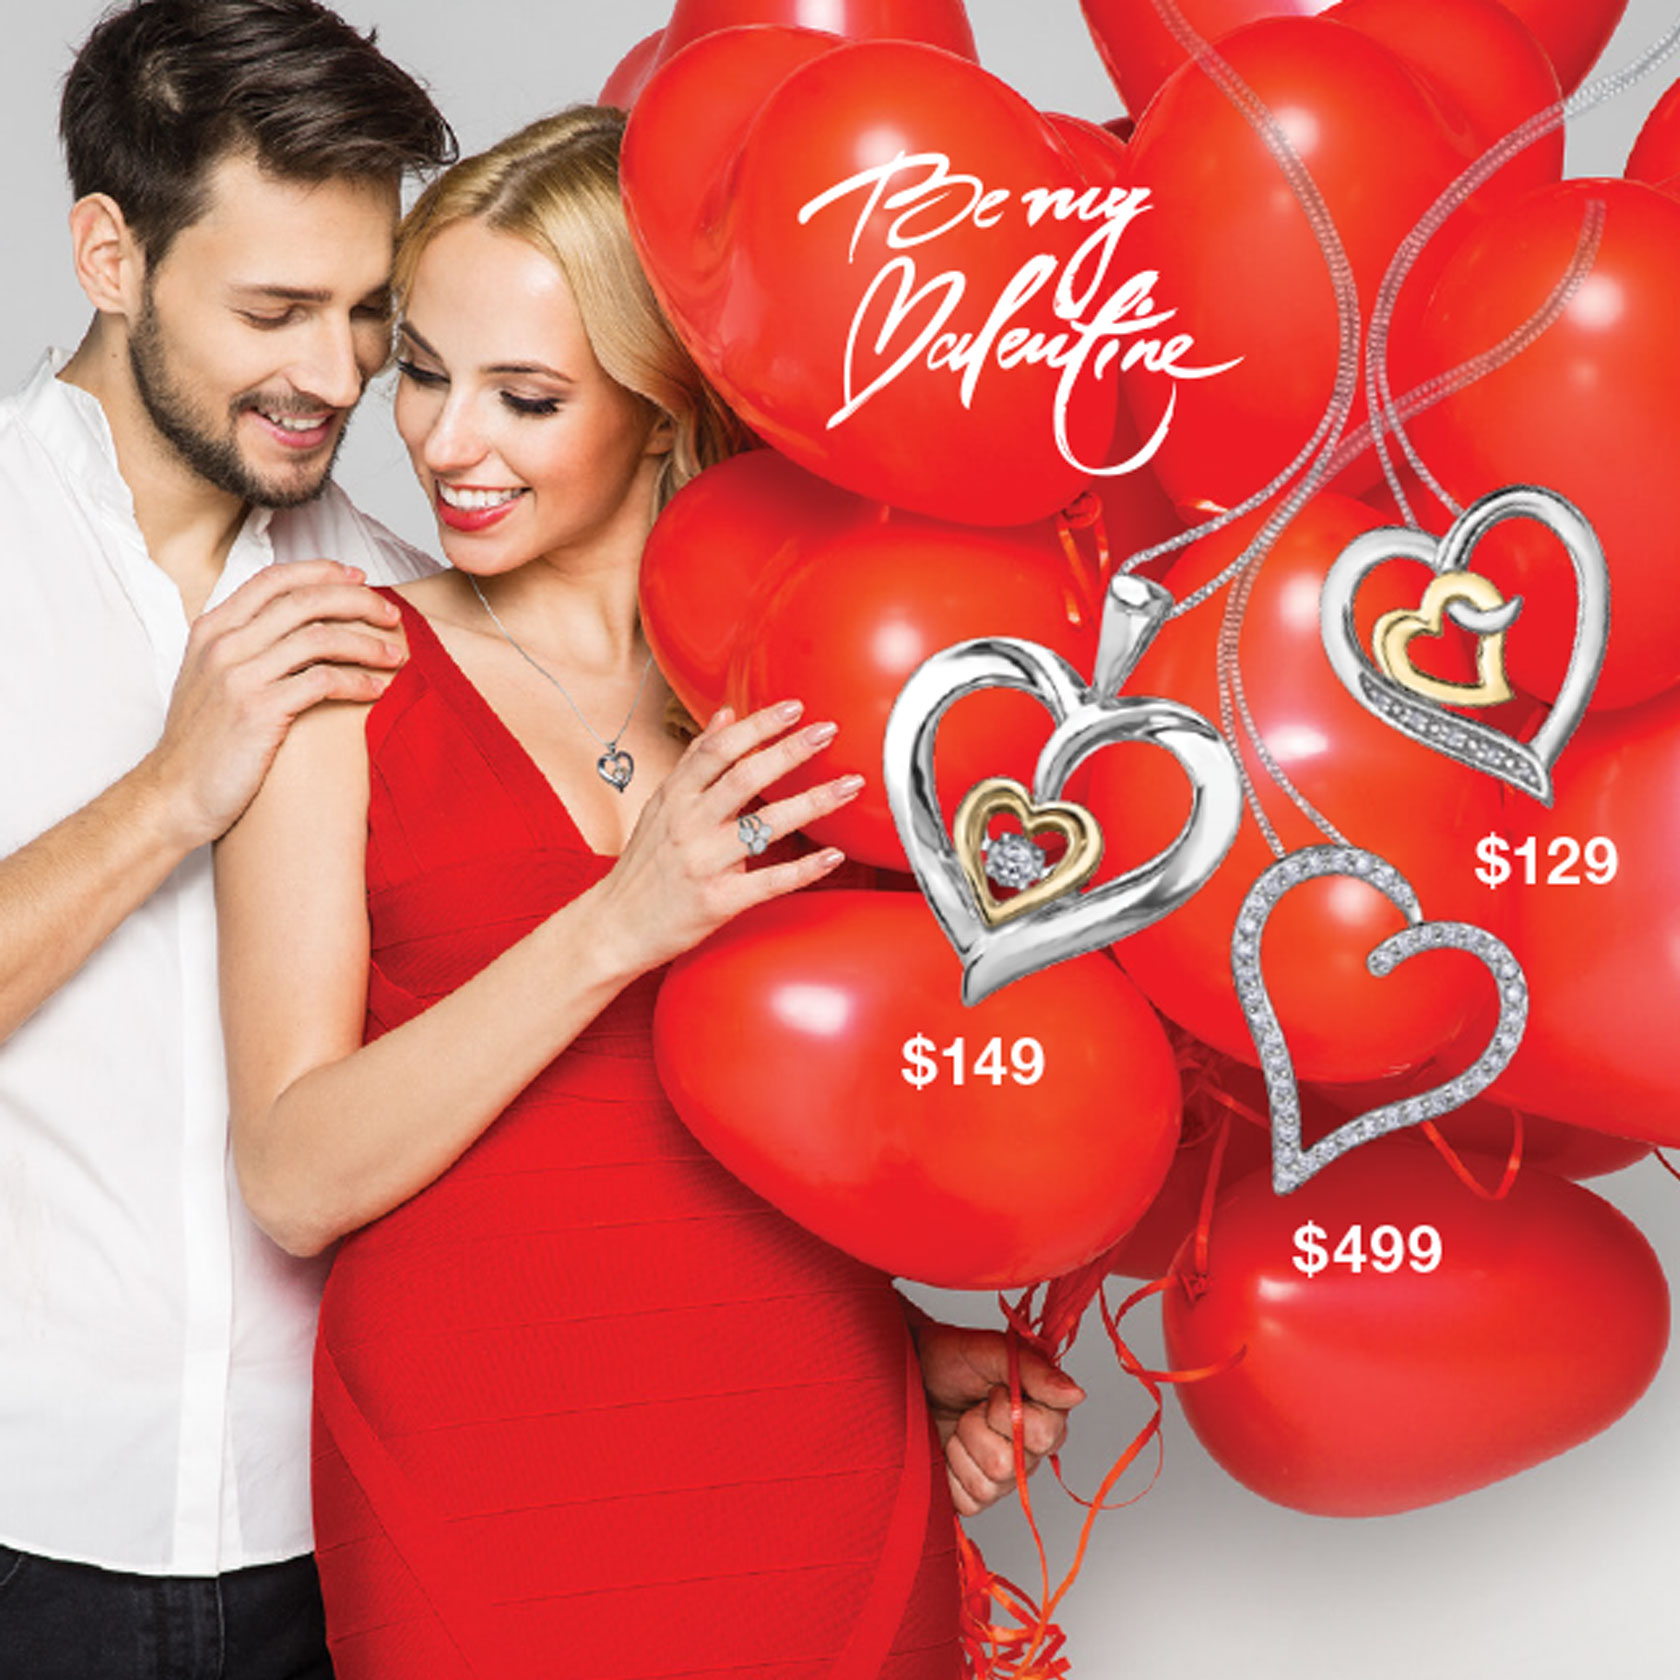 Be My Valentine 2018